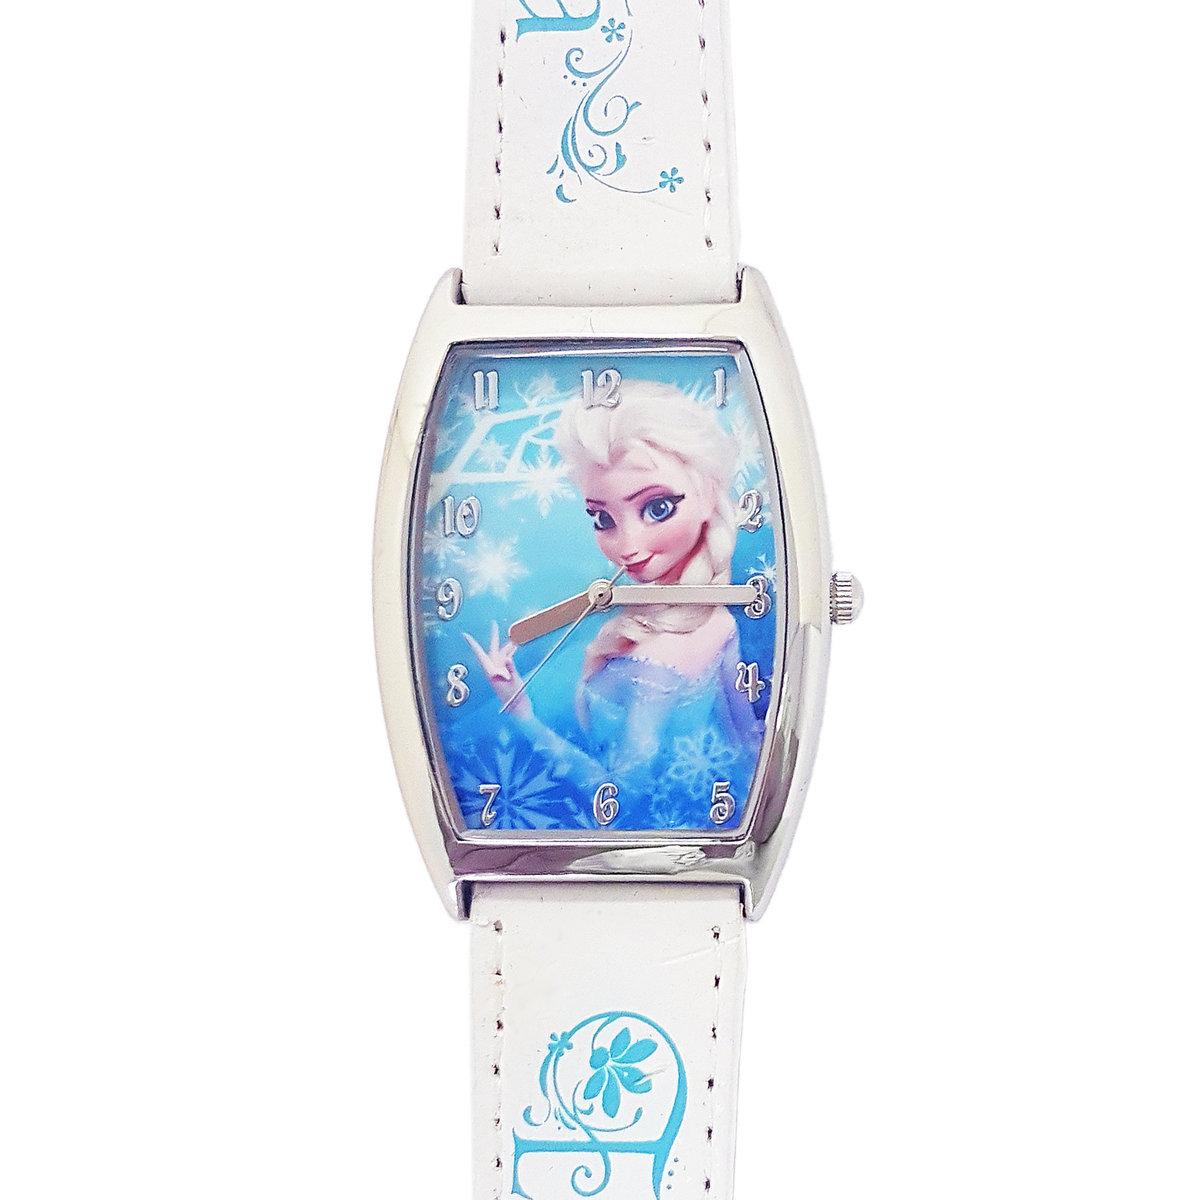 DISNEY FROZEN - Kids wrist watch - Whtie color (Licensed by Disney)